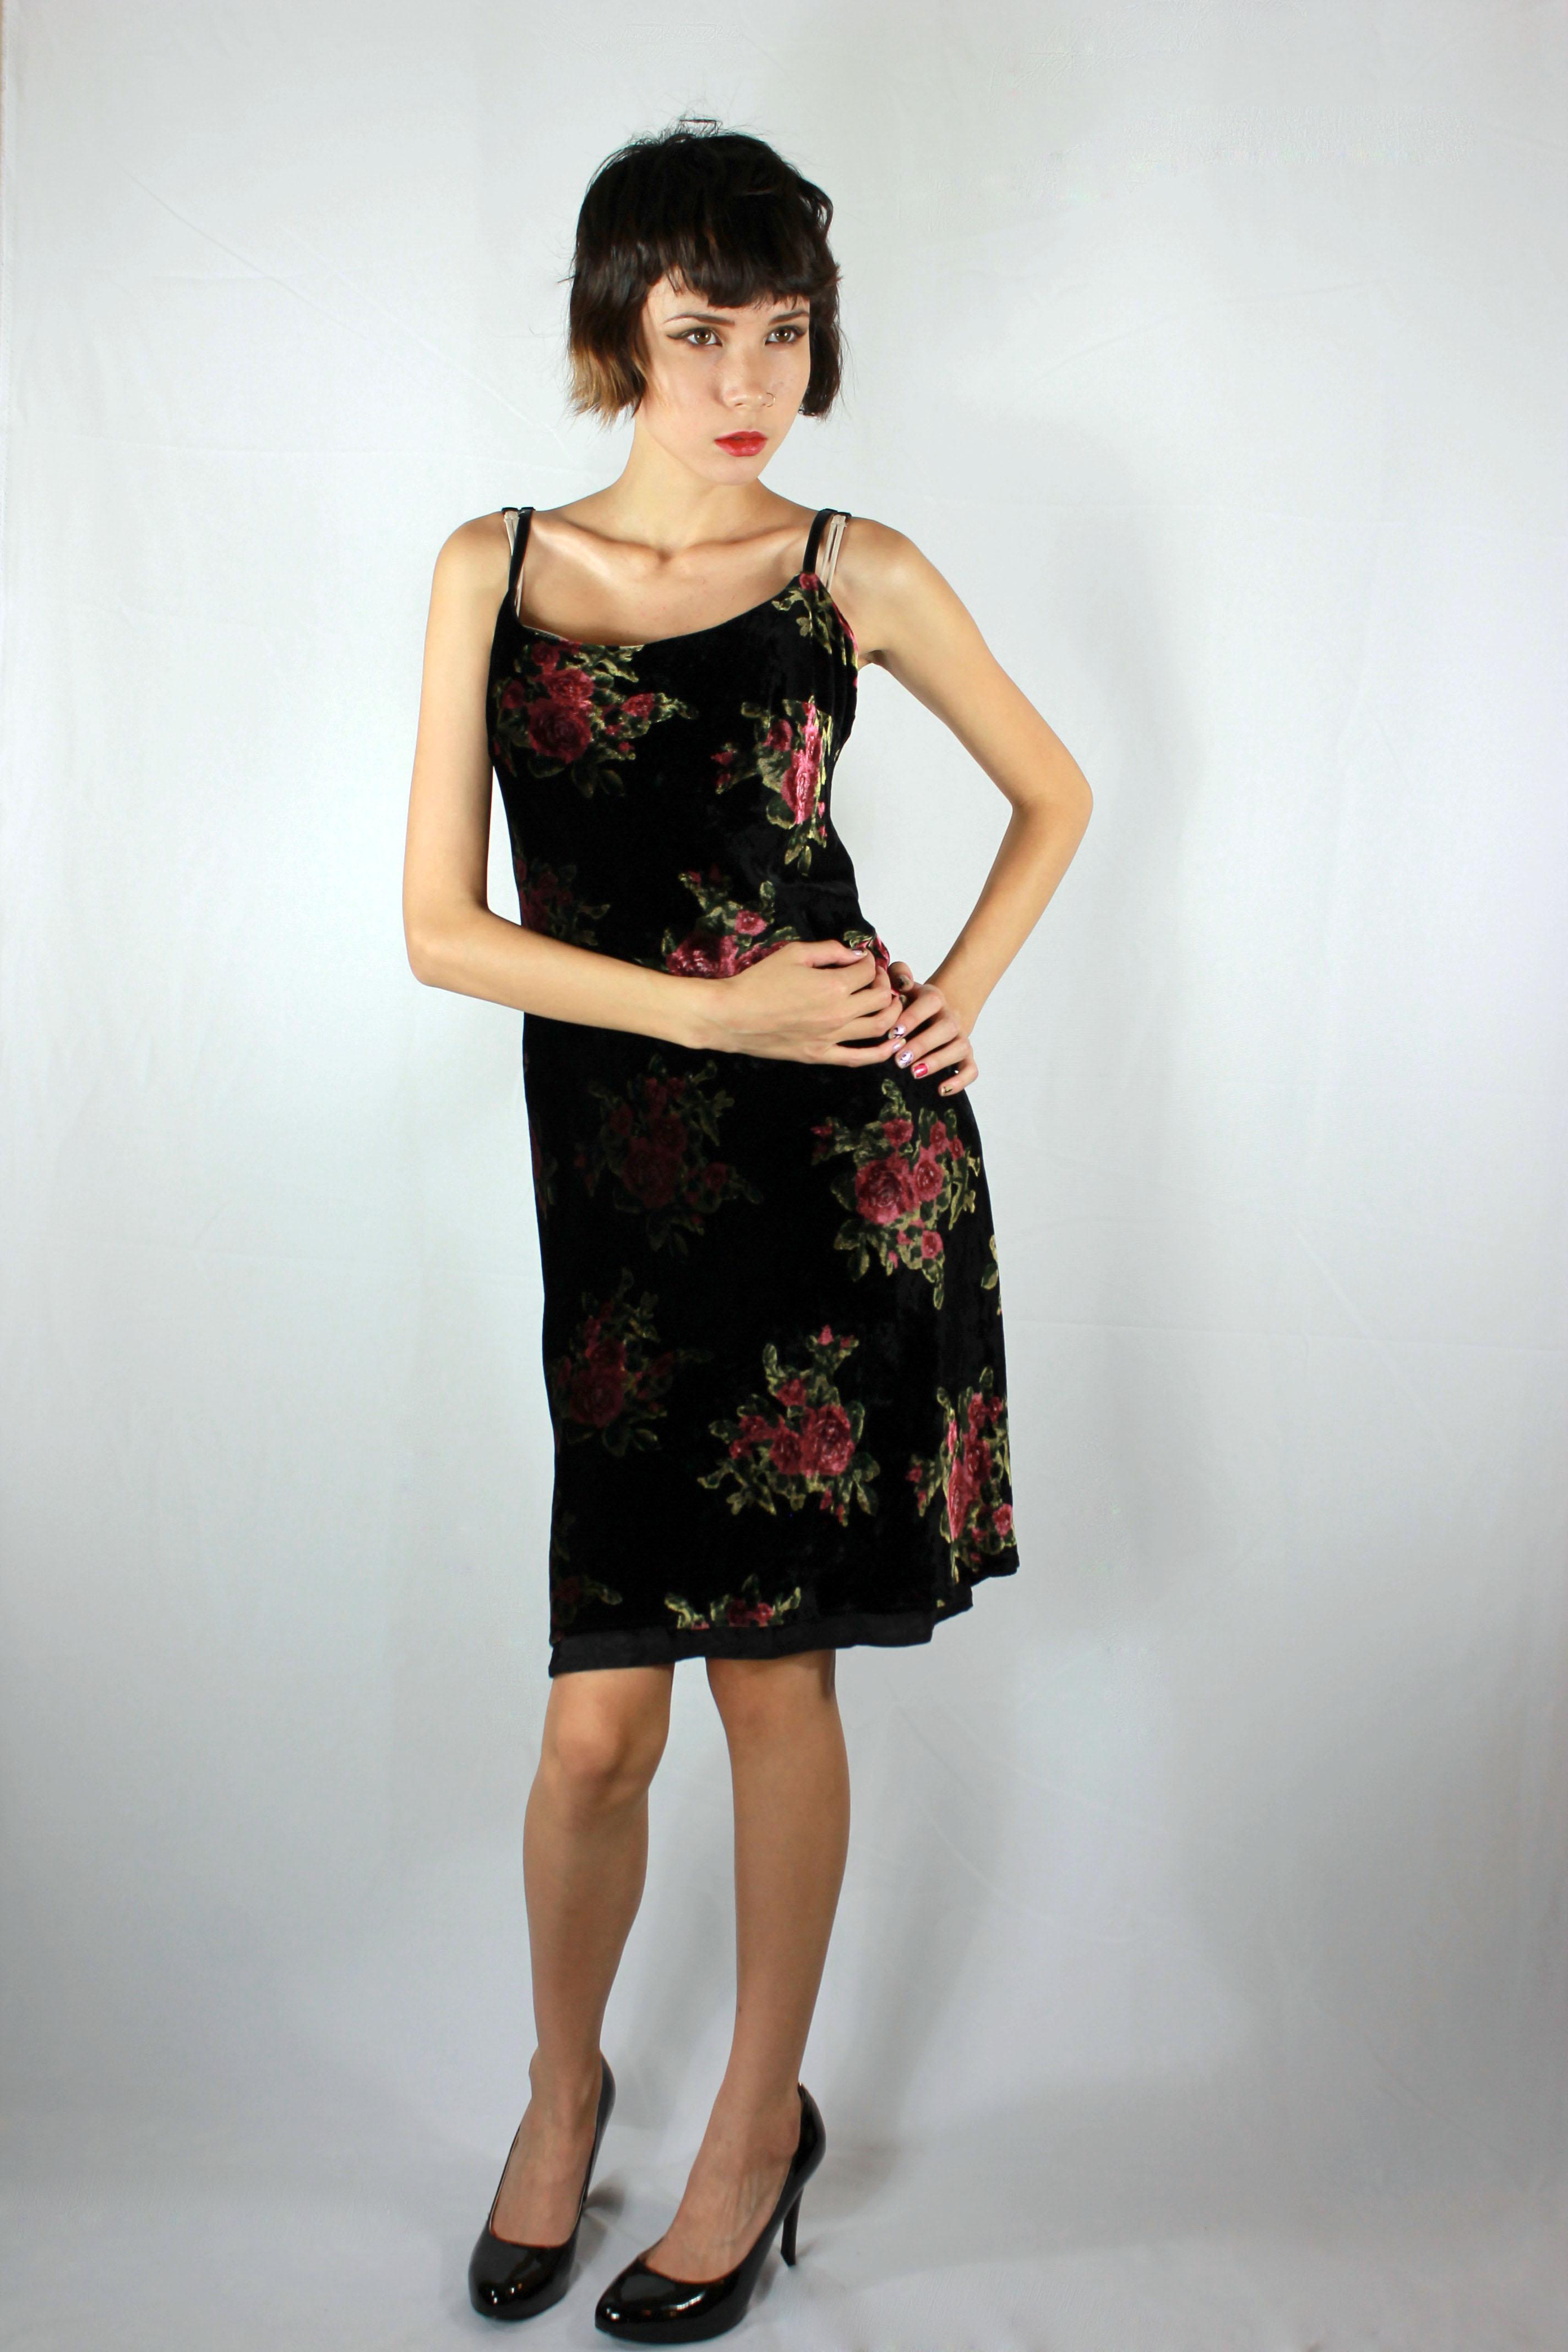 Pin Up Prom Dresses Tumblr | Dress images